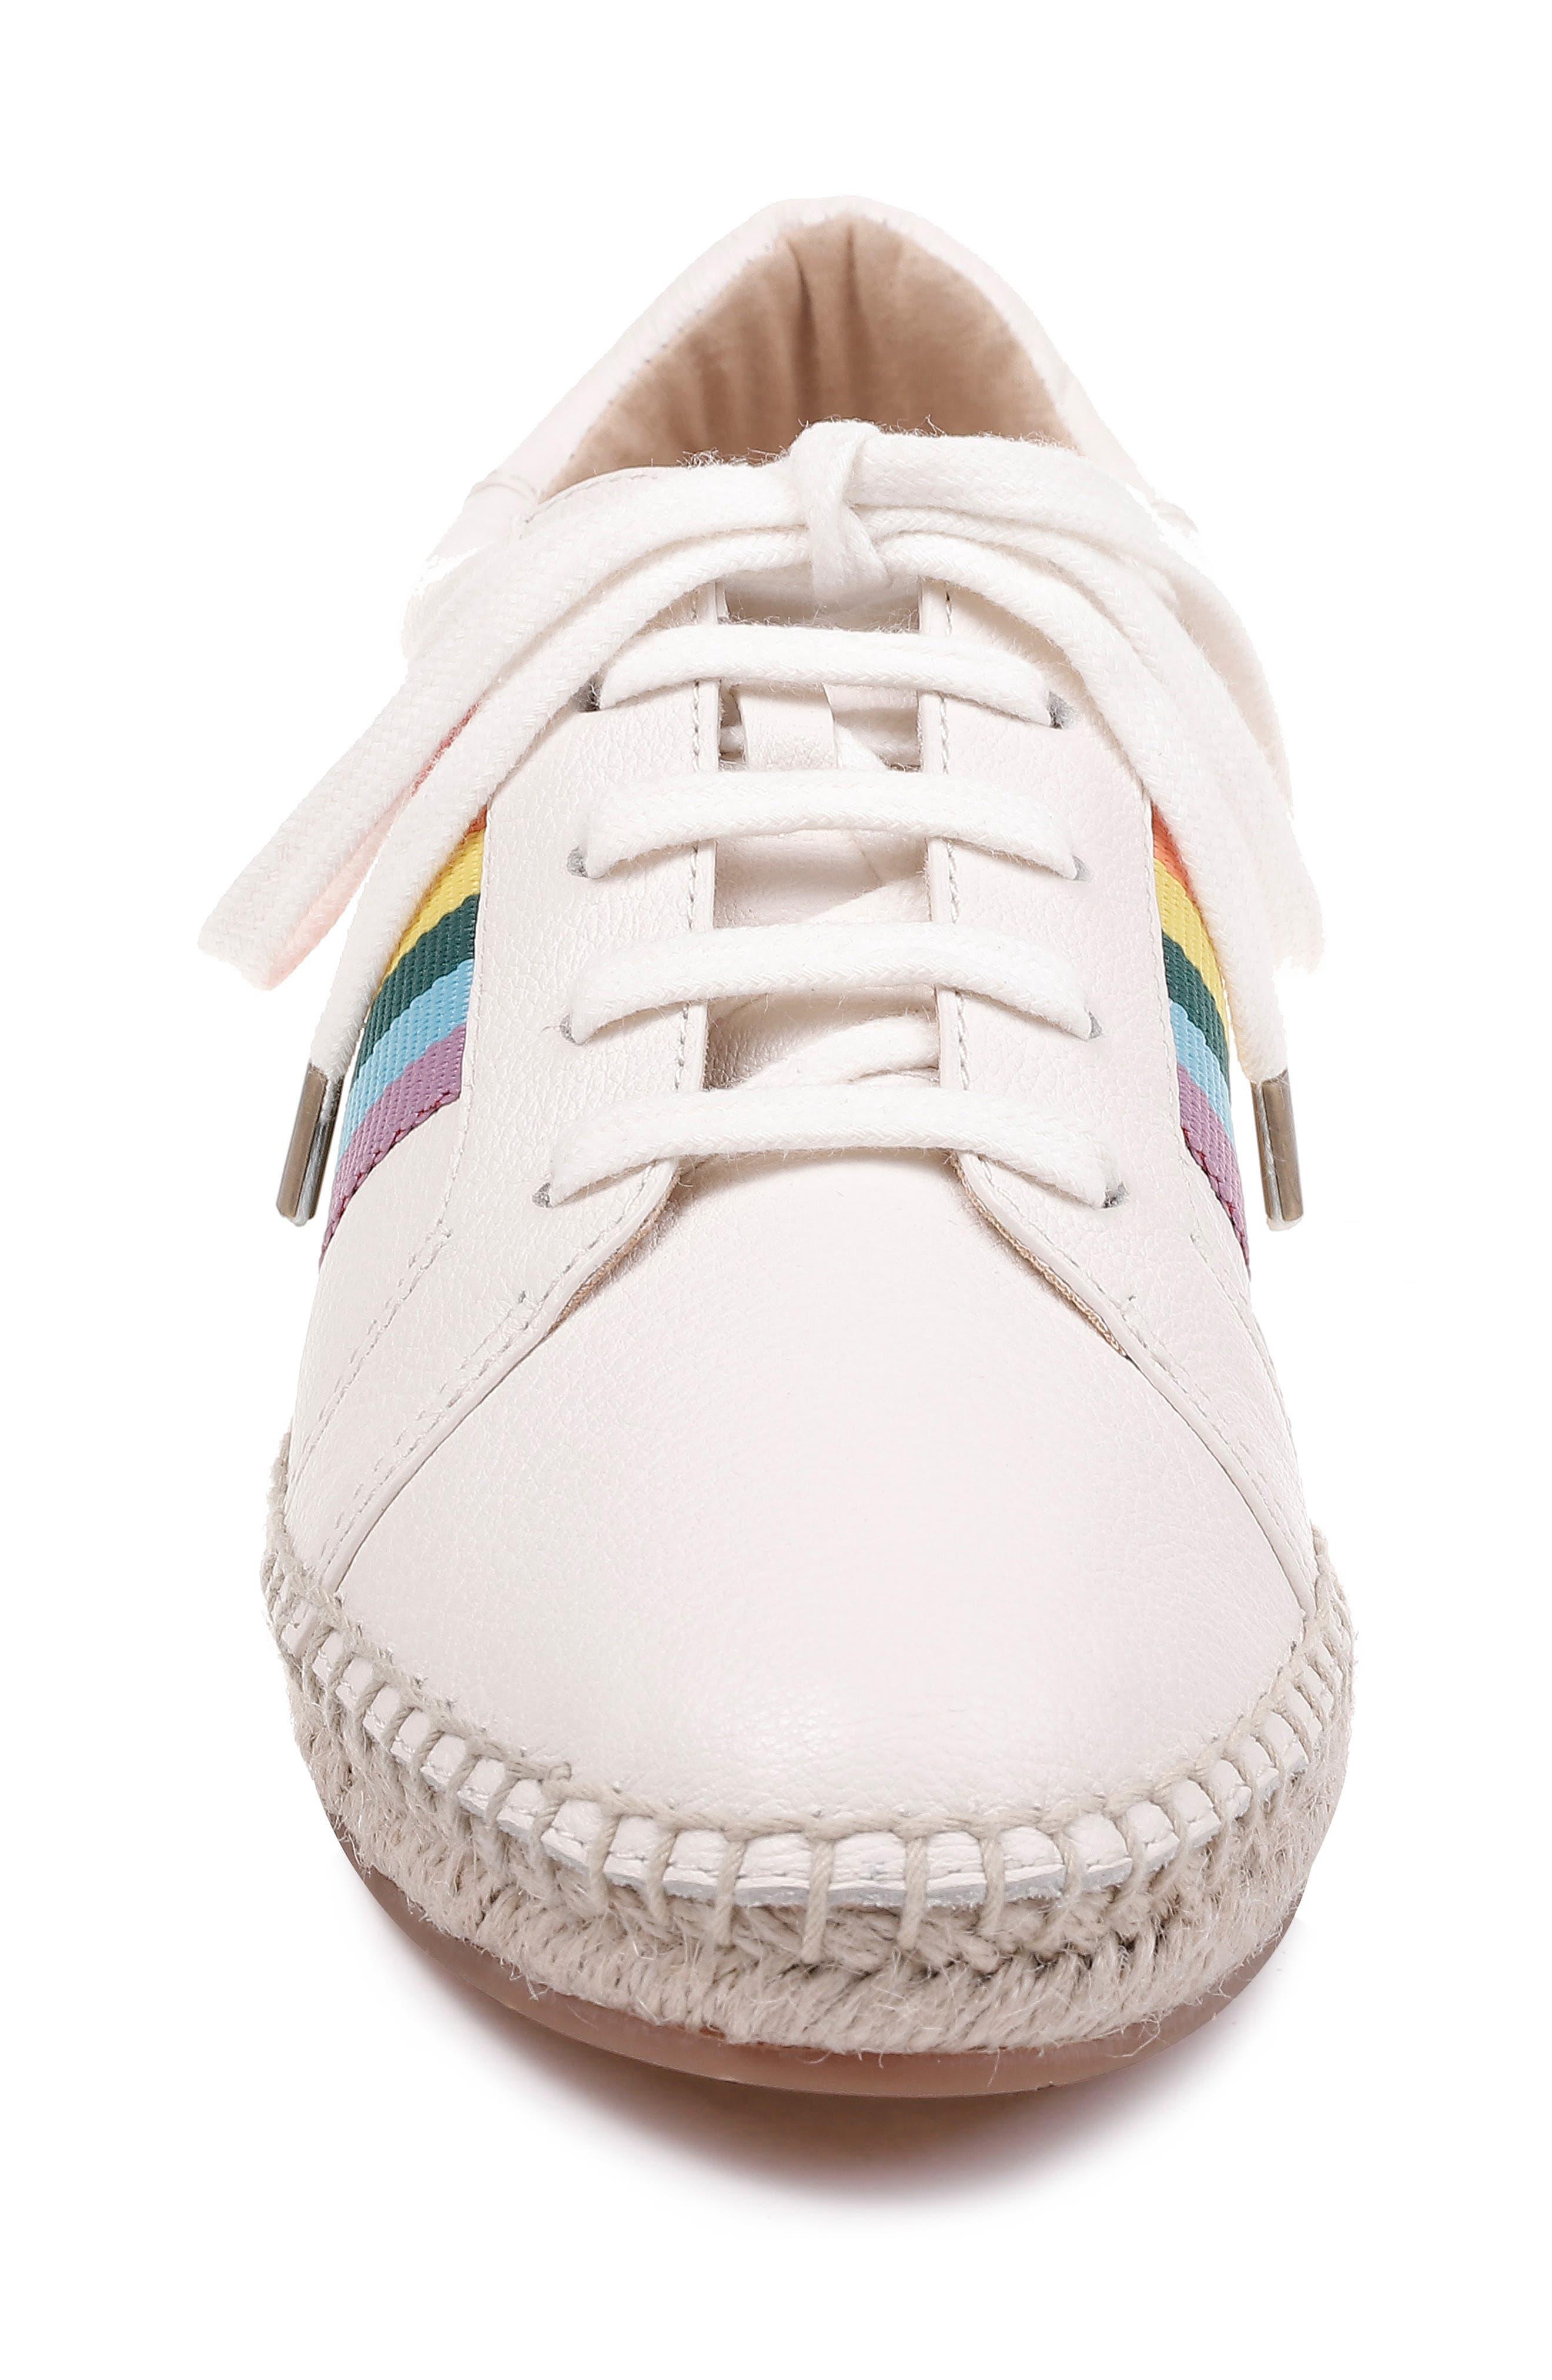 SPLENDID, Sada Espadrille Sneaker, Alternate thumbnail 4, color, OFF WHITE LEATHER